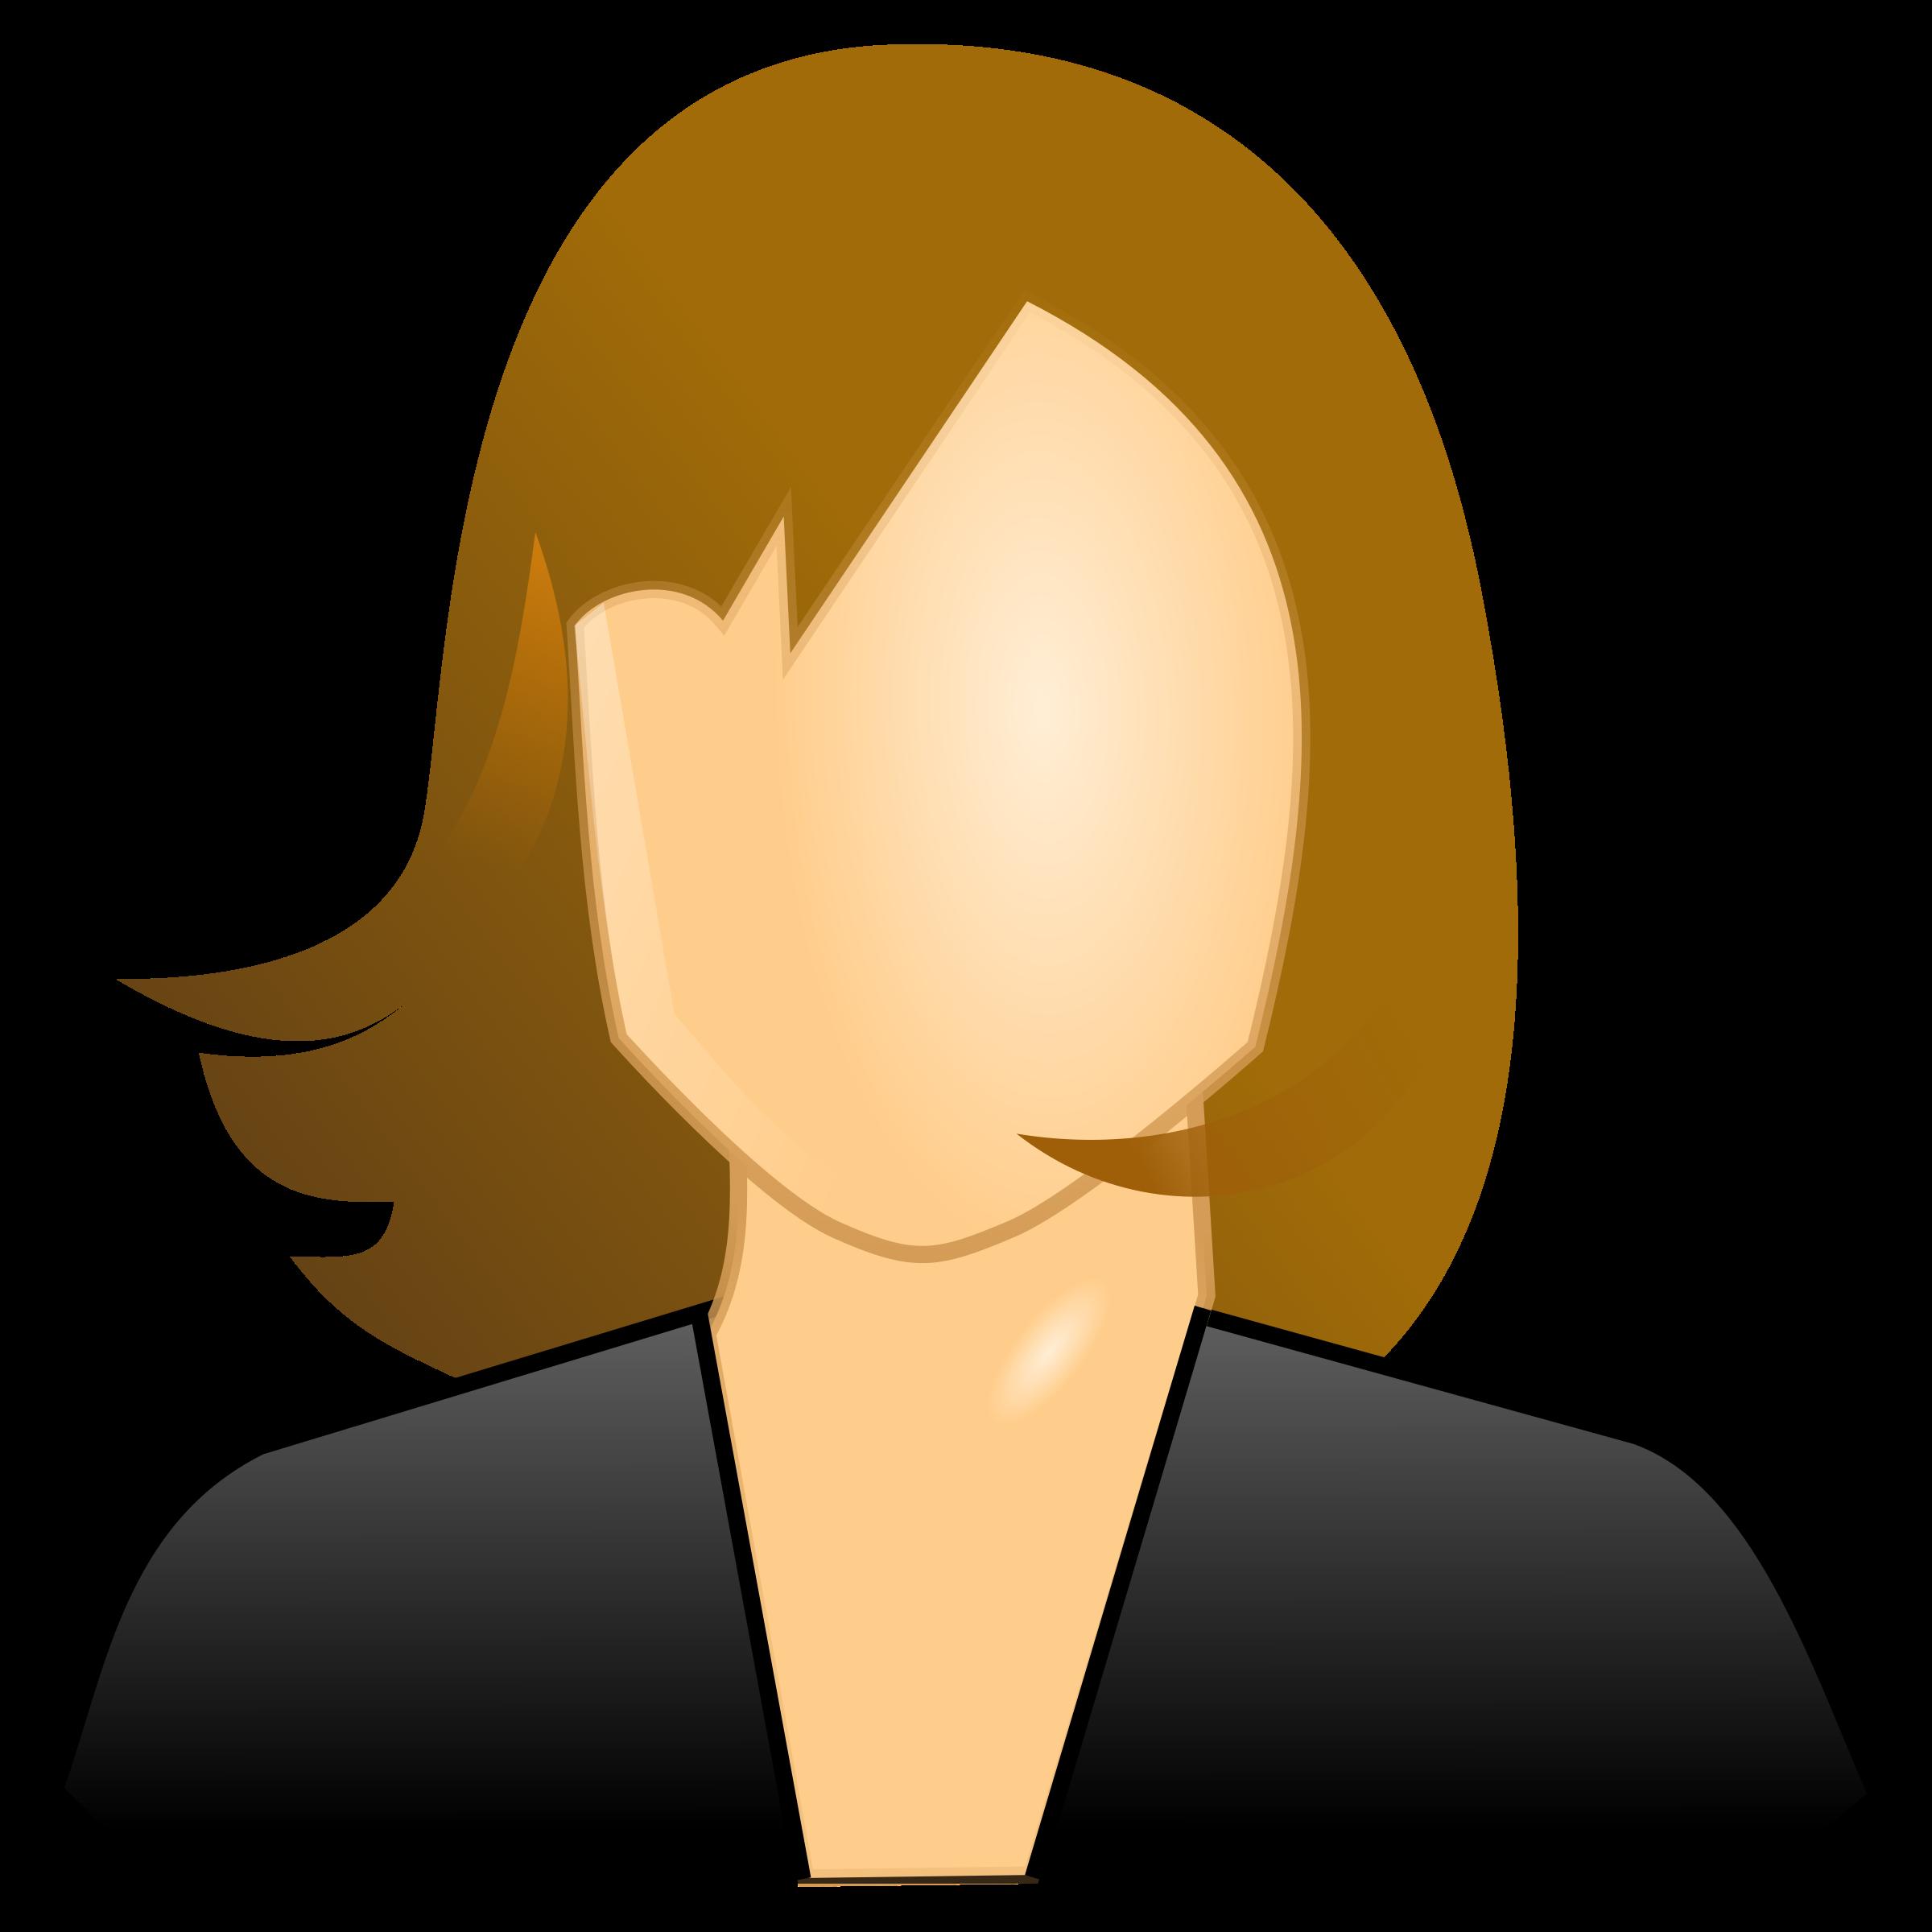 d0427d36a54068e1e6df77b0ab446215_clipart-female-user-icon-user-clipart-transparent_2400-2400